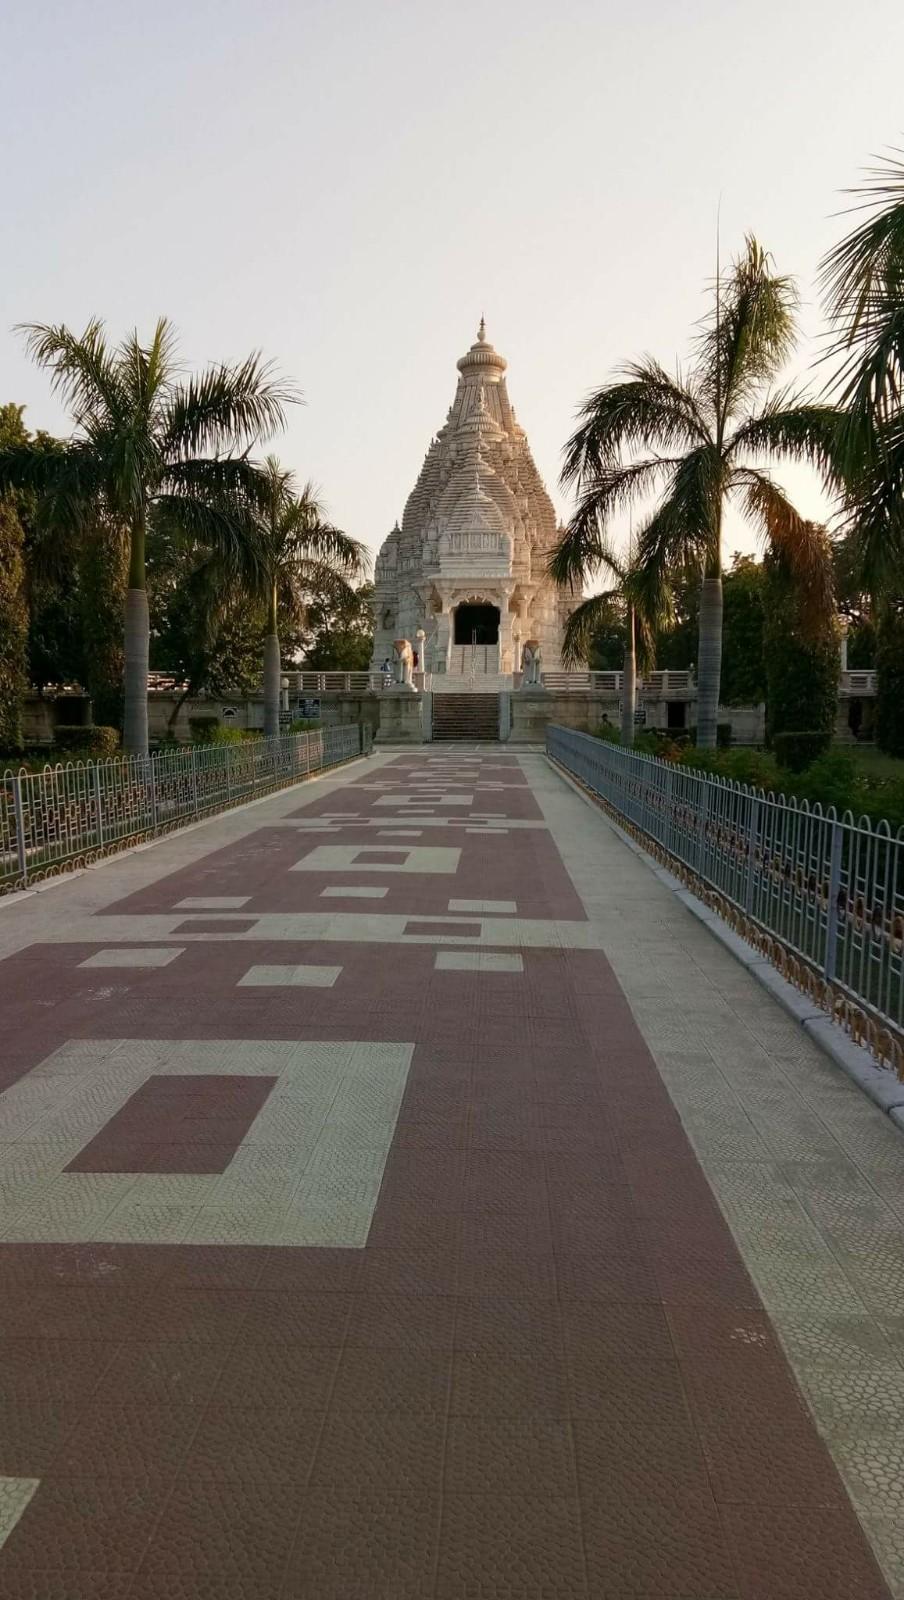 Saraswati Temple inside the campus of BITS, Pilani,India